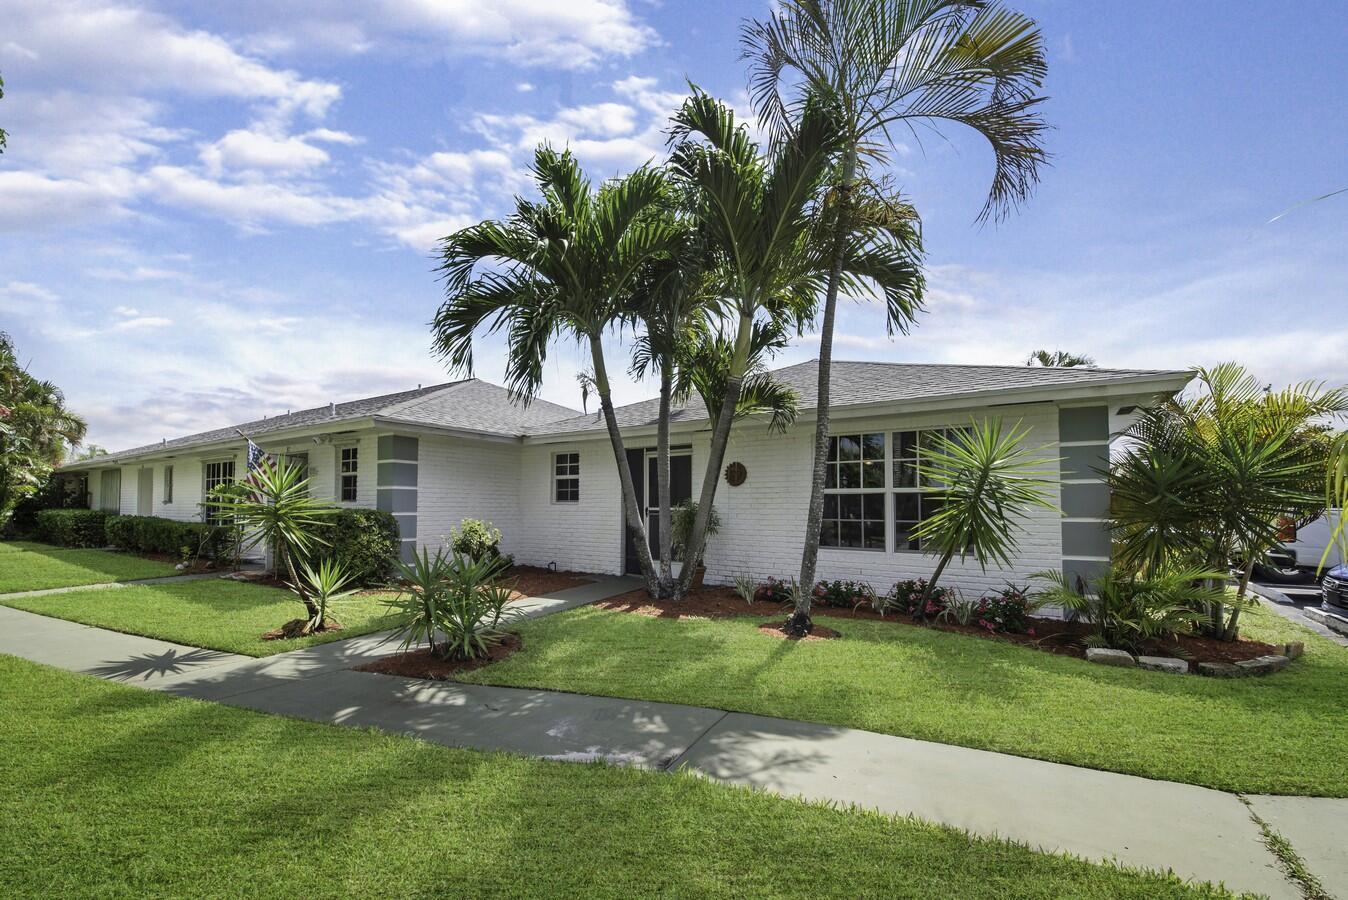 Home for sale in Villas Of Golf View Harbour Boynton Beach Florida